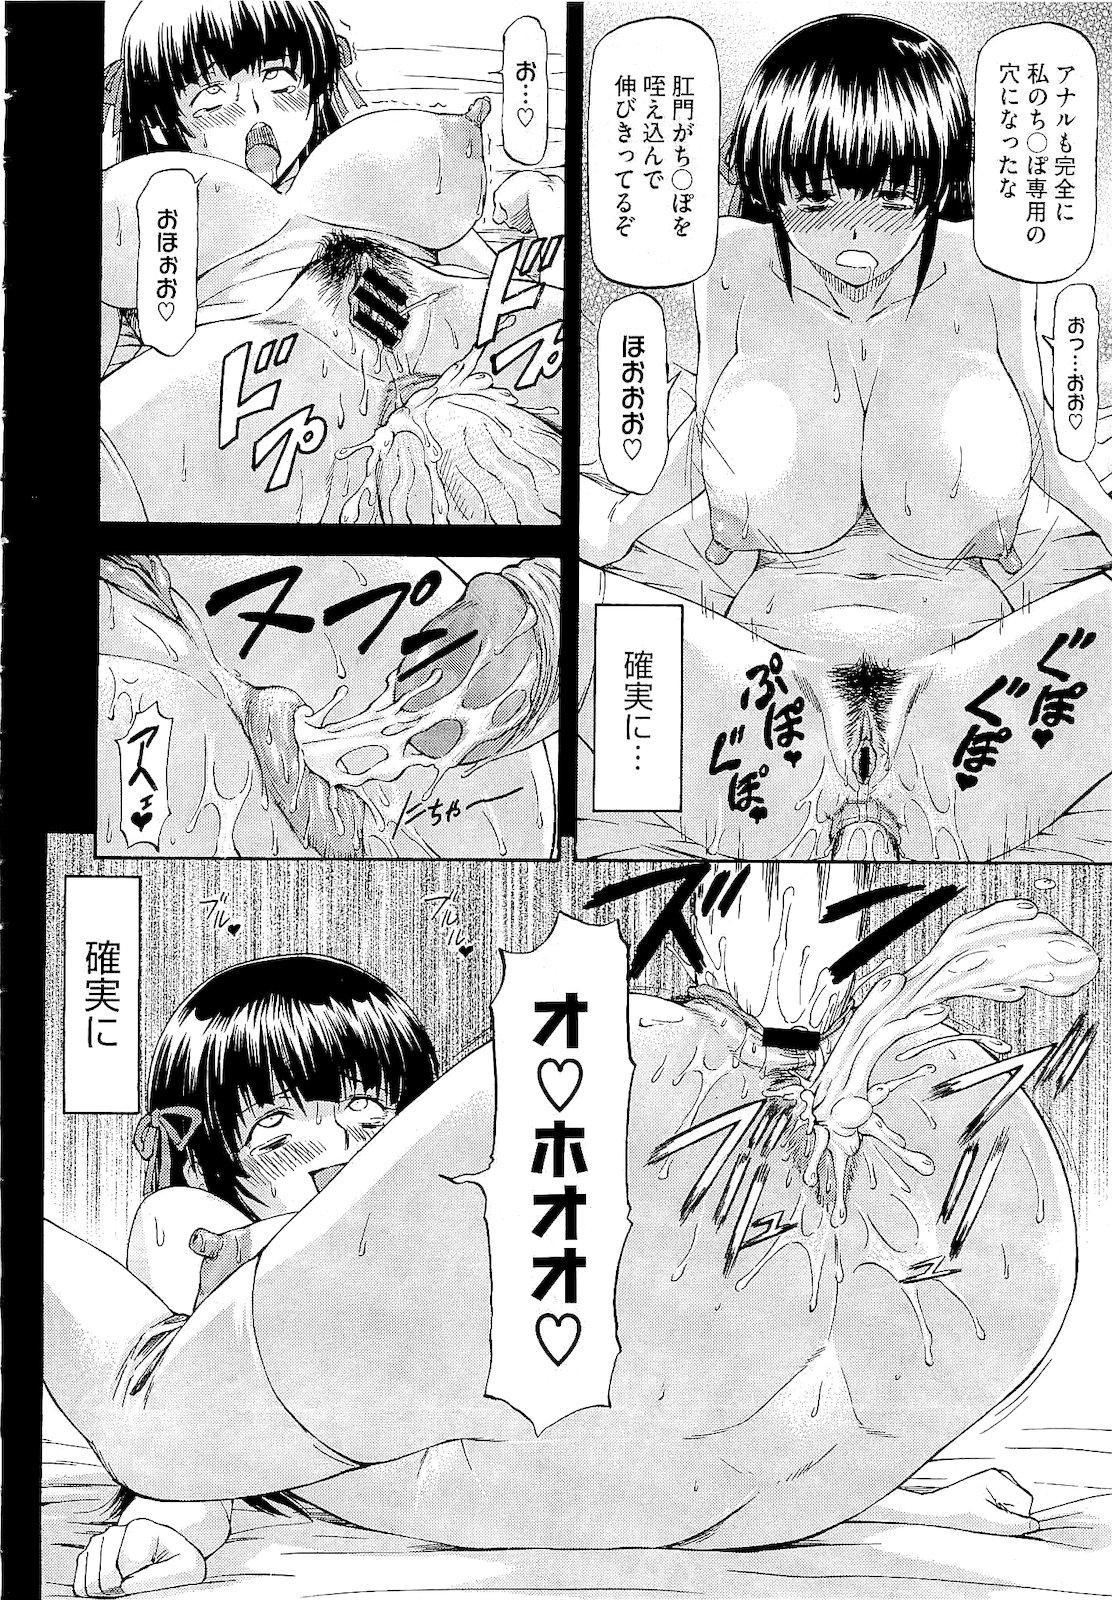 COMIC Megastore 2011-02 287